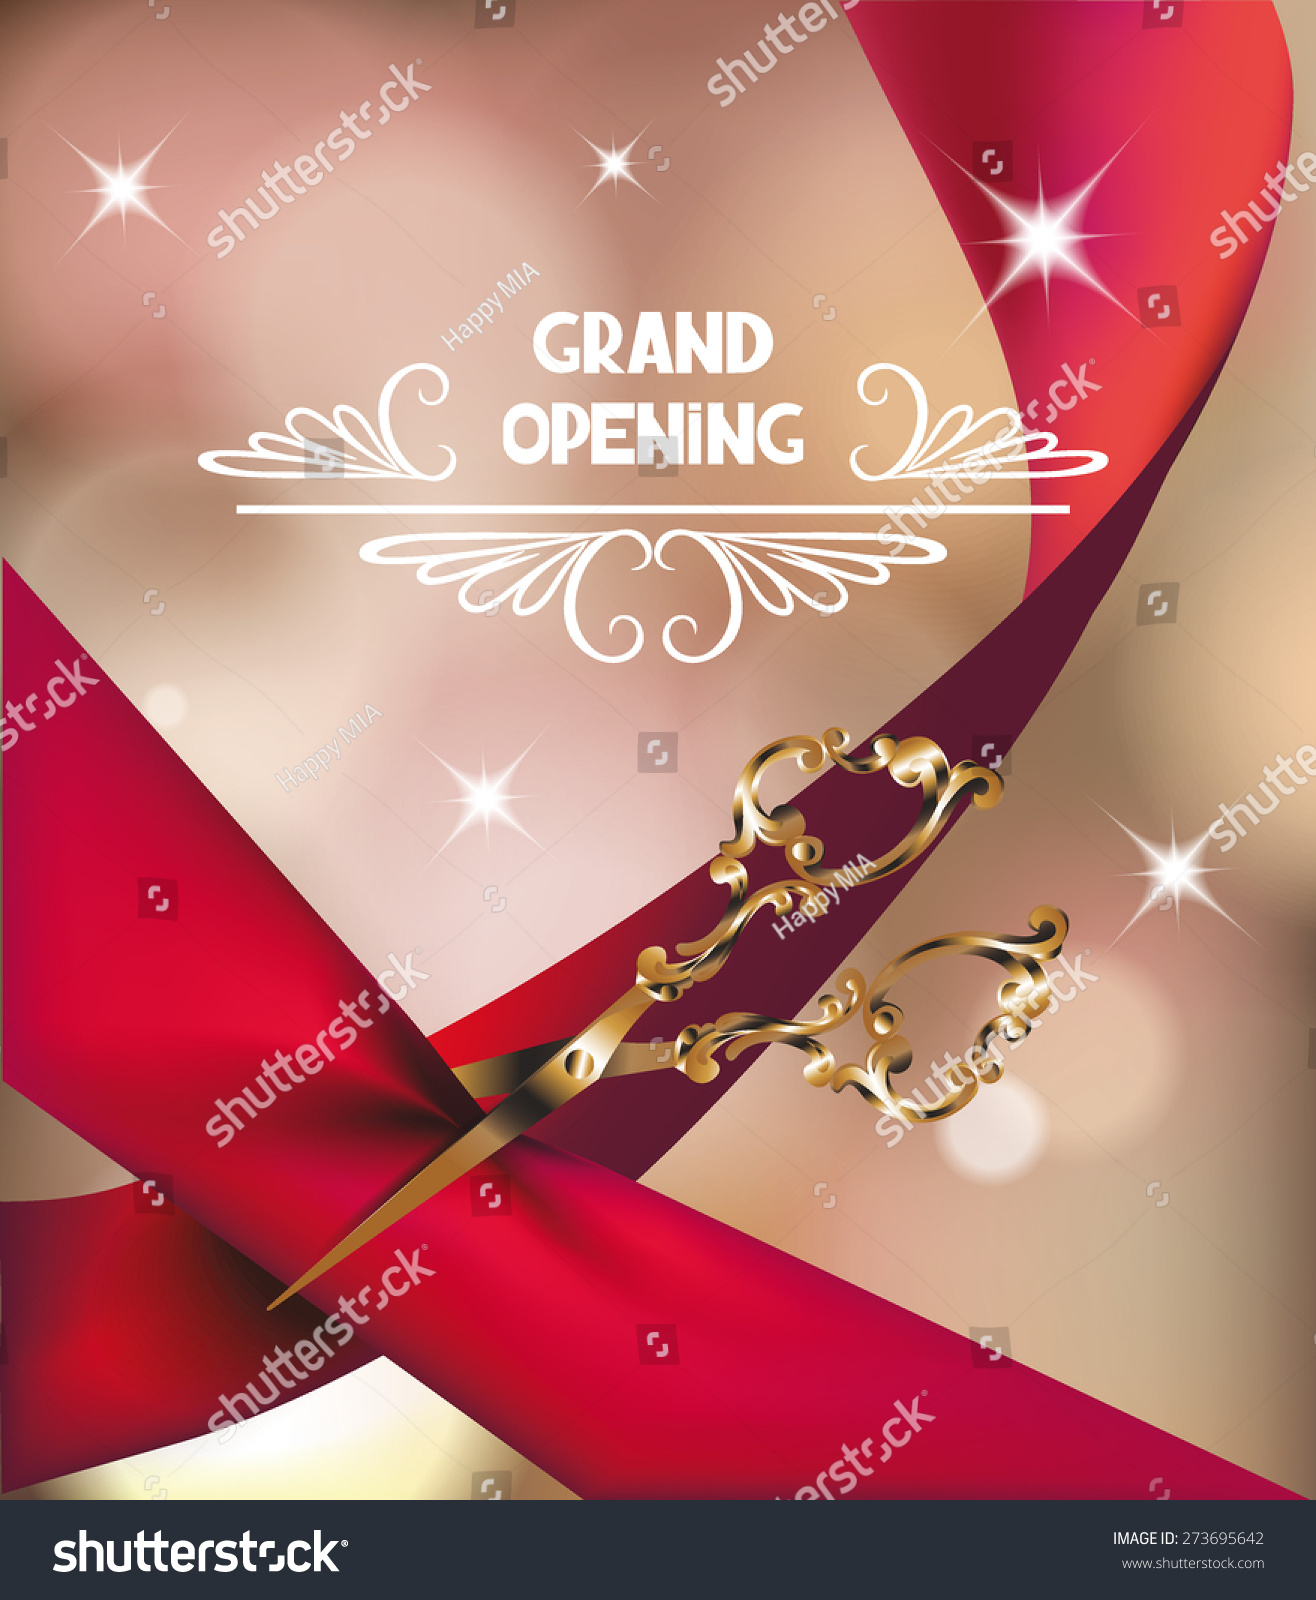 Invitation wording for opening ceremony futureclimfo invitation wording for opening ceremony with nice invitation template stopboris Images